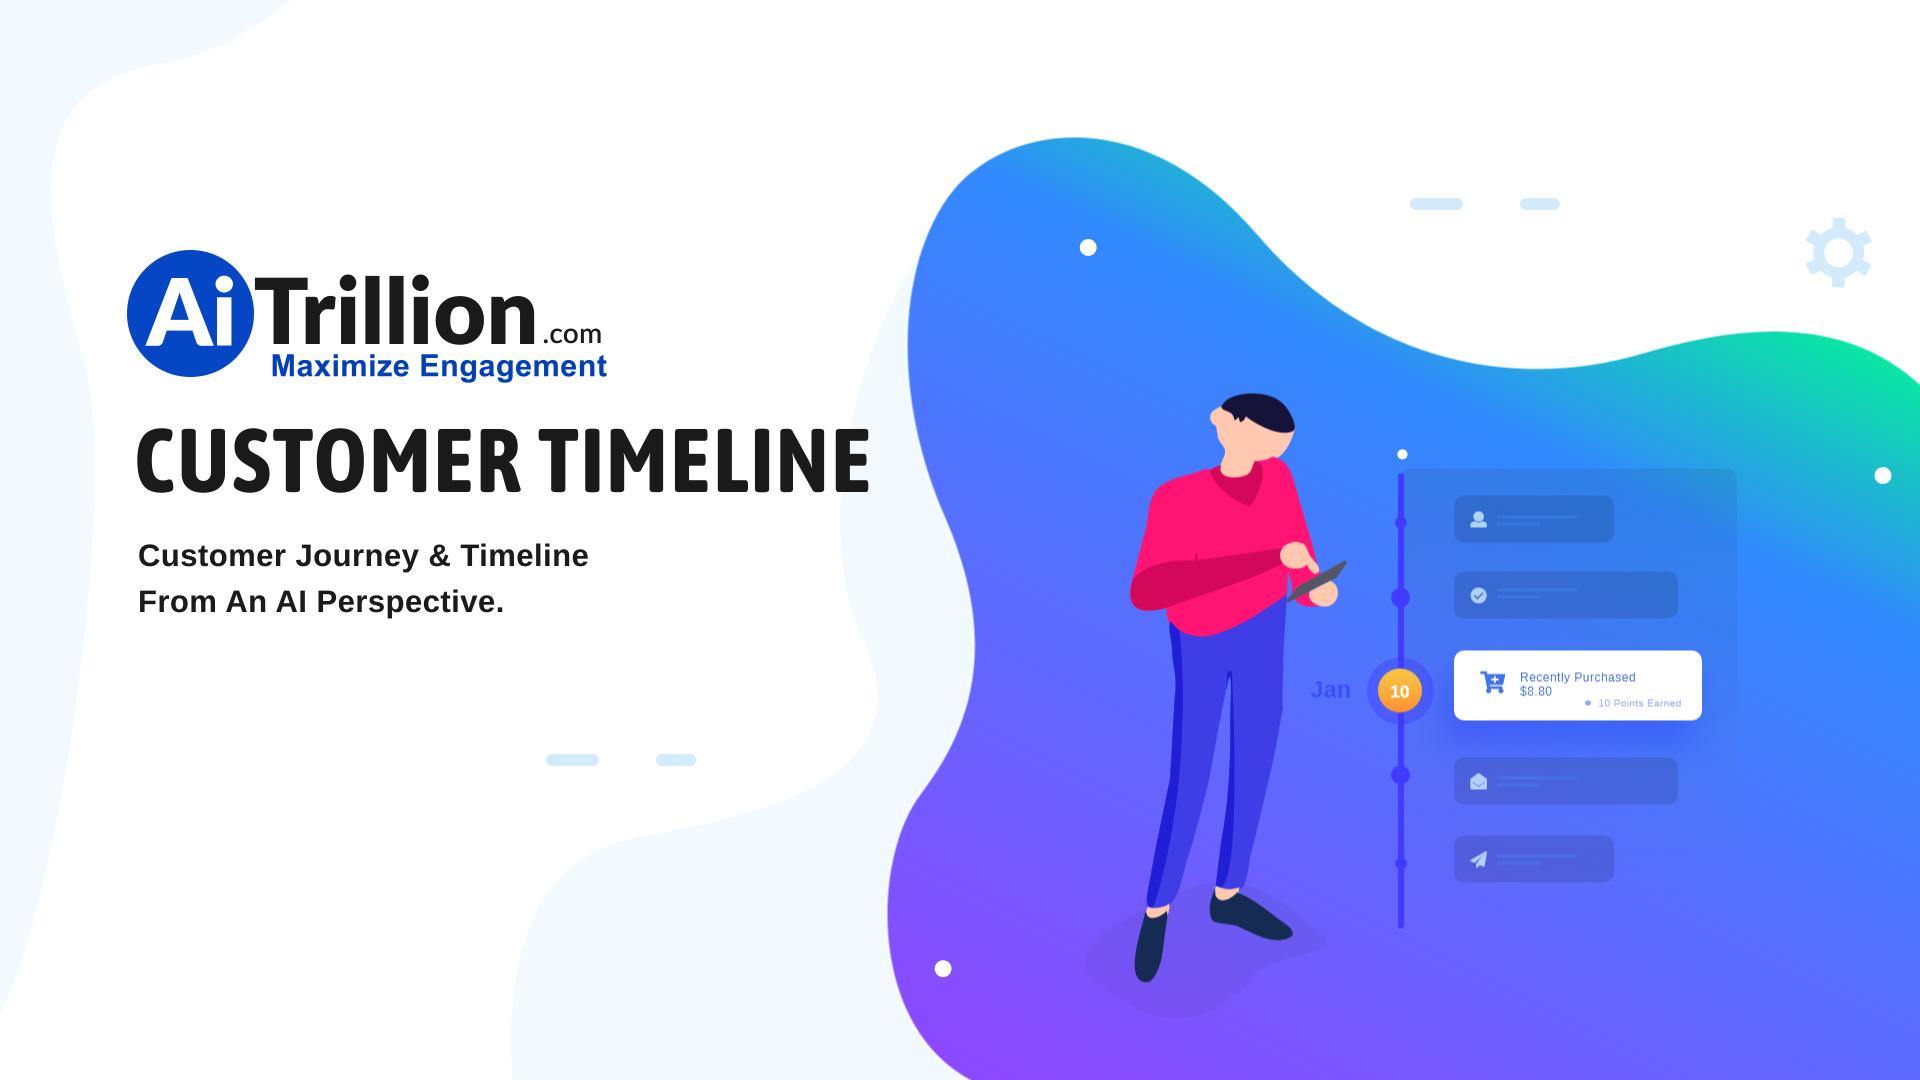 Customer Timeline